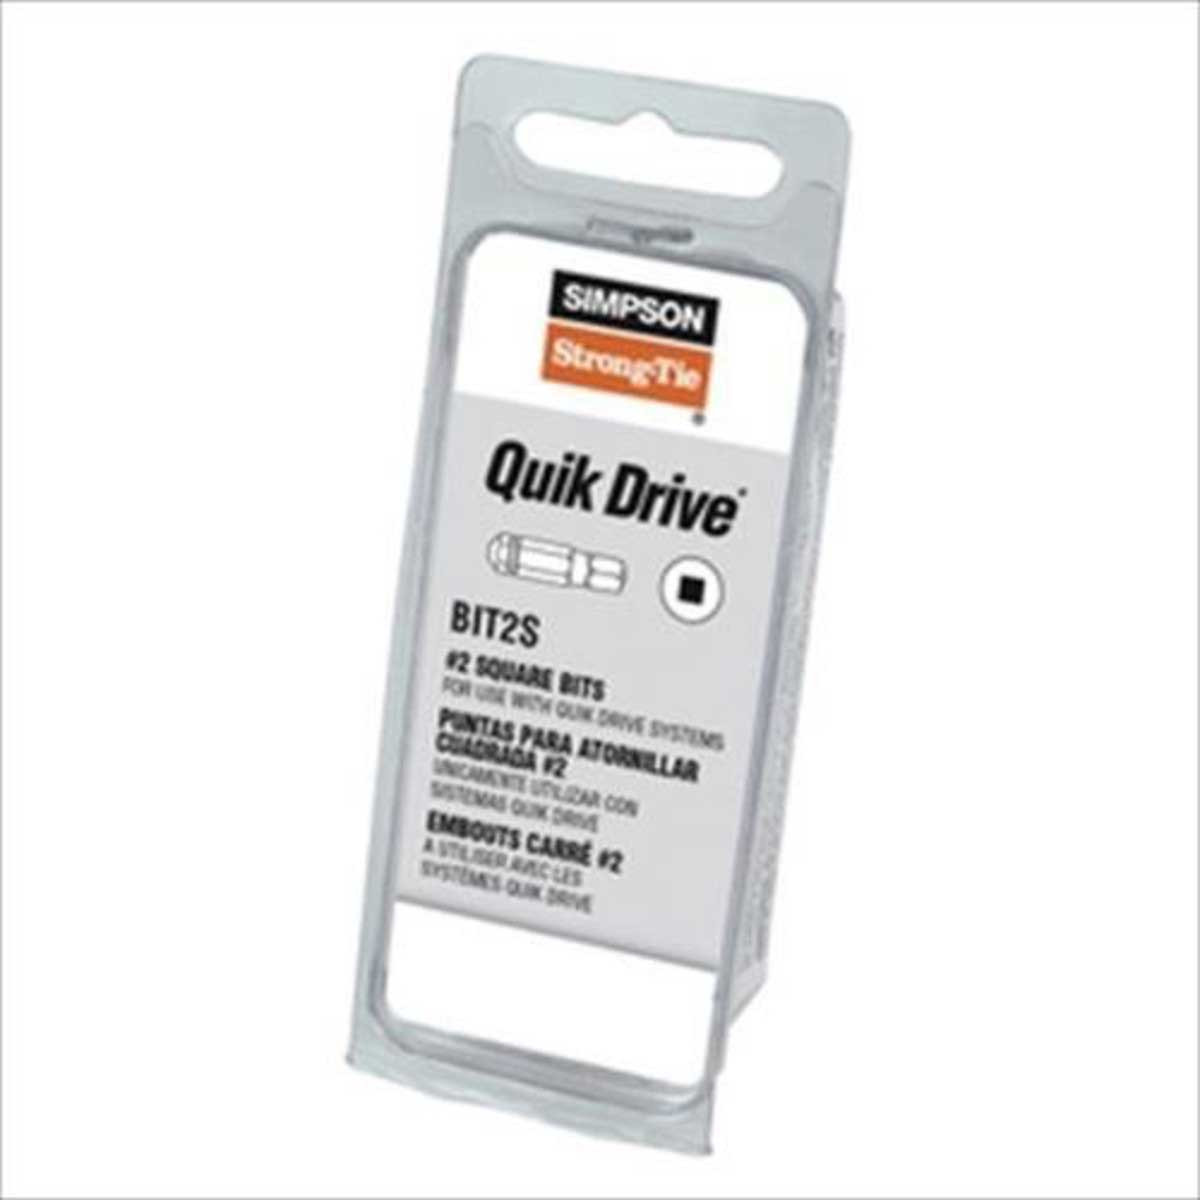 Bit2S-RC3 Quik Drive 3 each #2 Square Drive Bit Kit